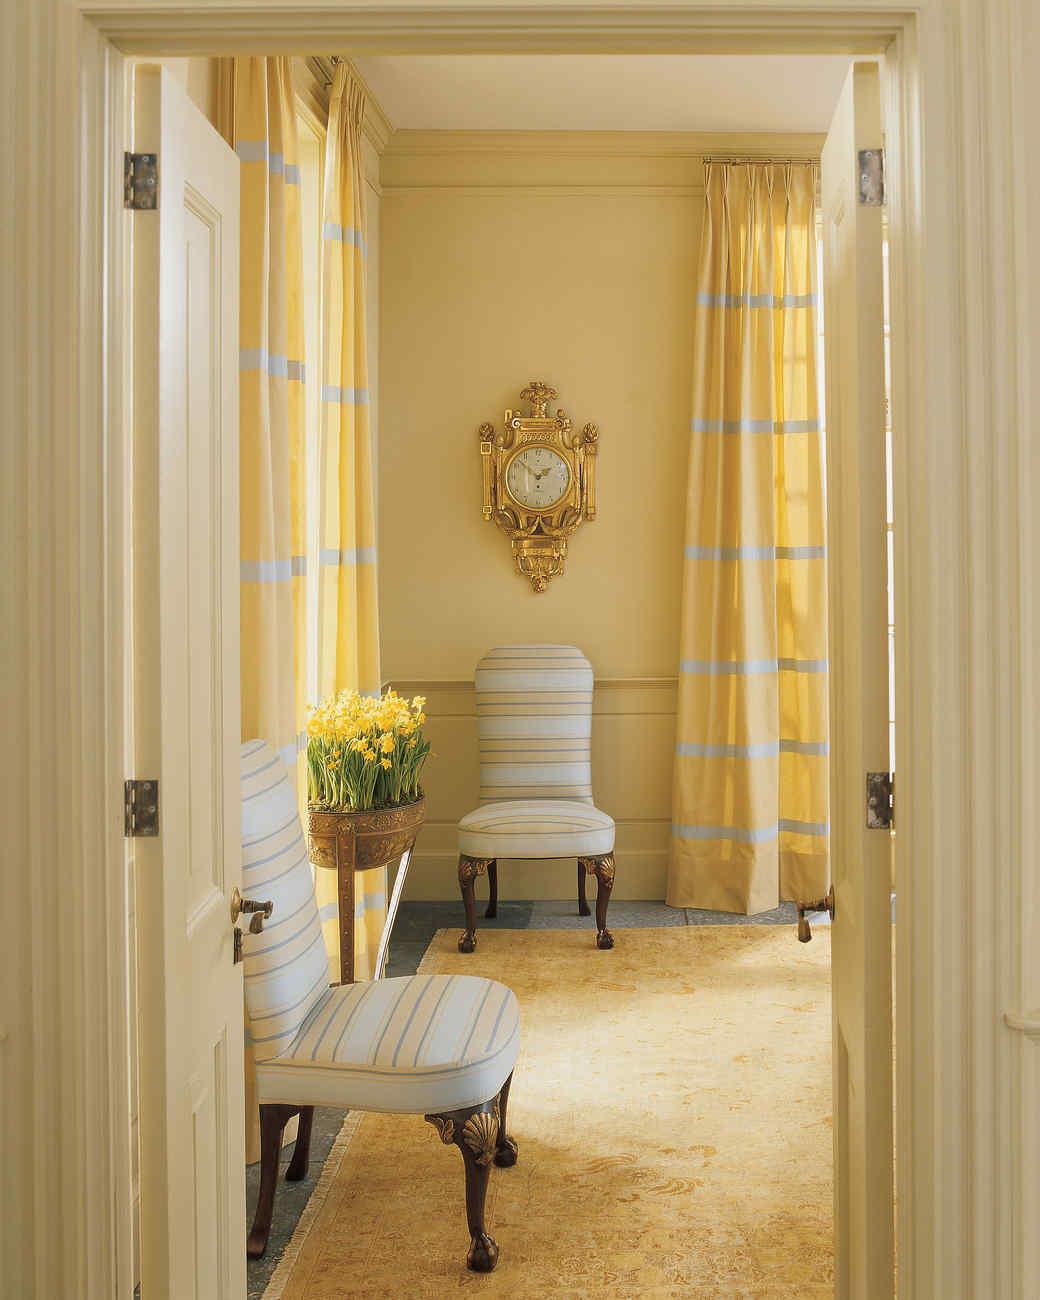 Yellow Paint Walls Ideas - Home Design Ideas